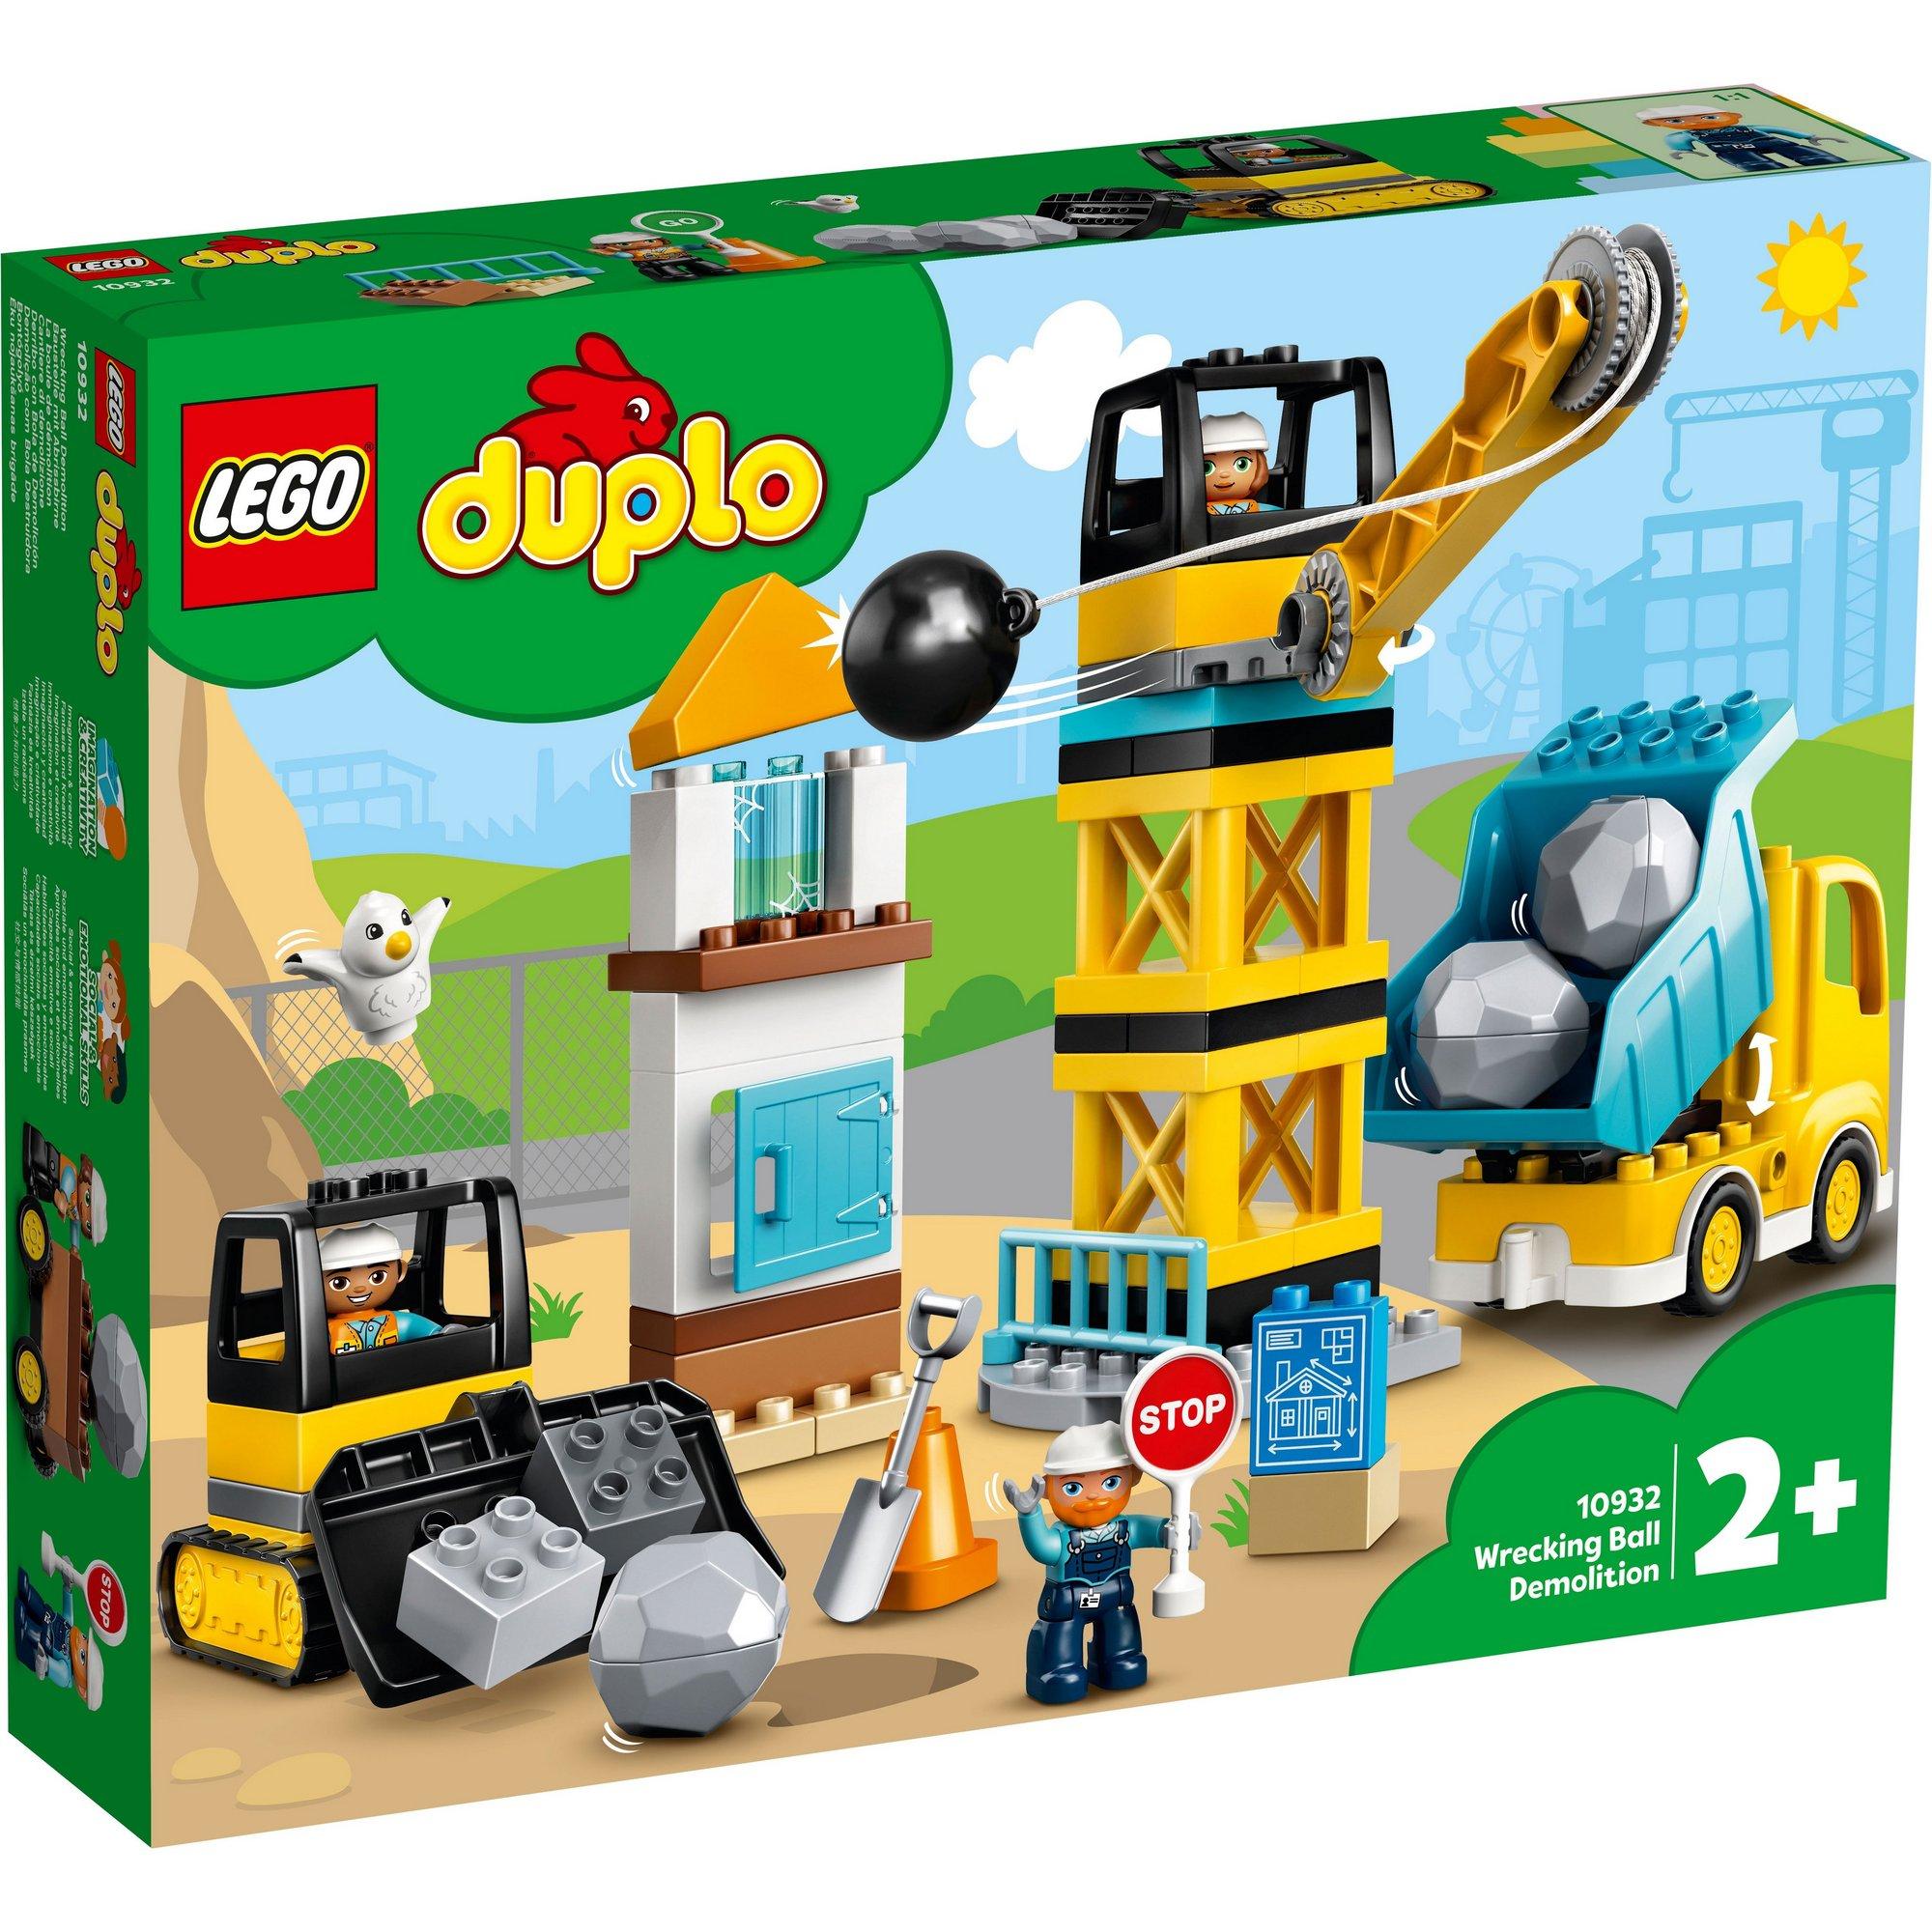 Image of LEGO DUPLO Town Wrecking Ball Demolition